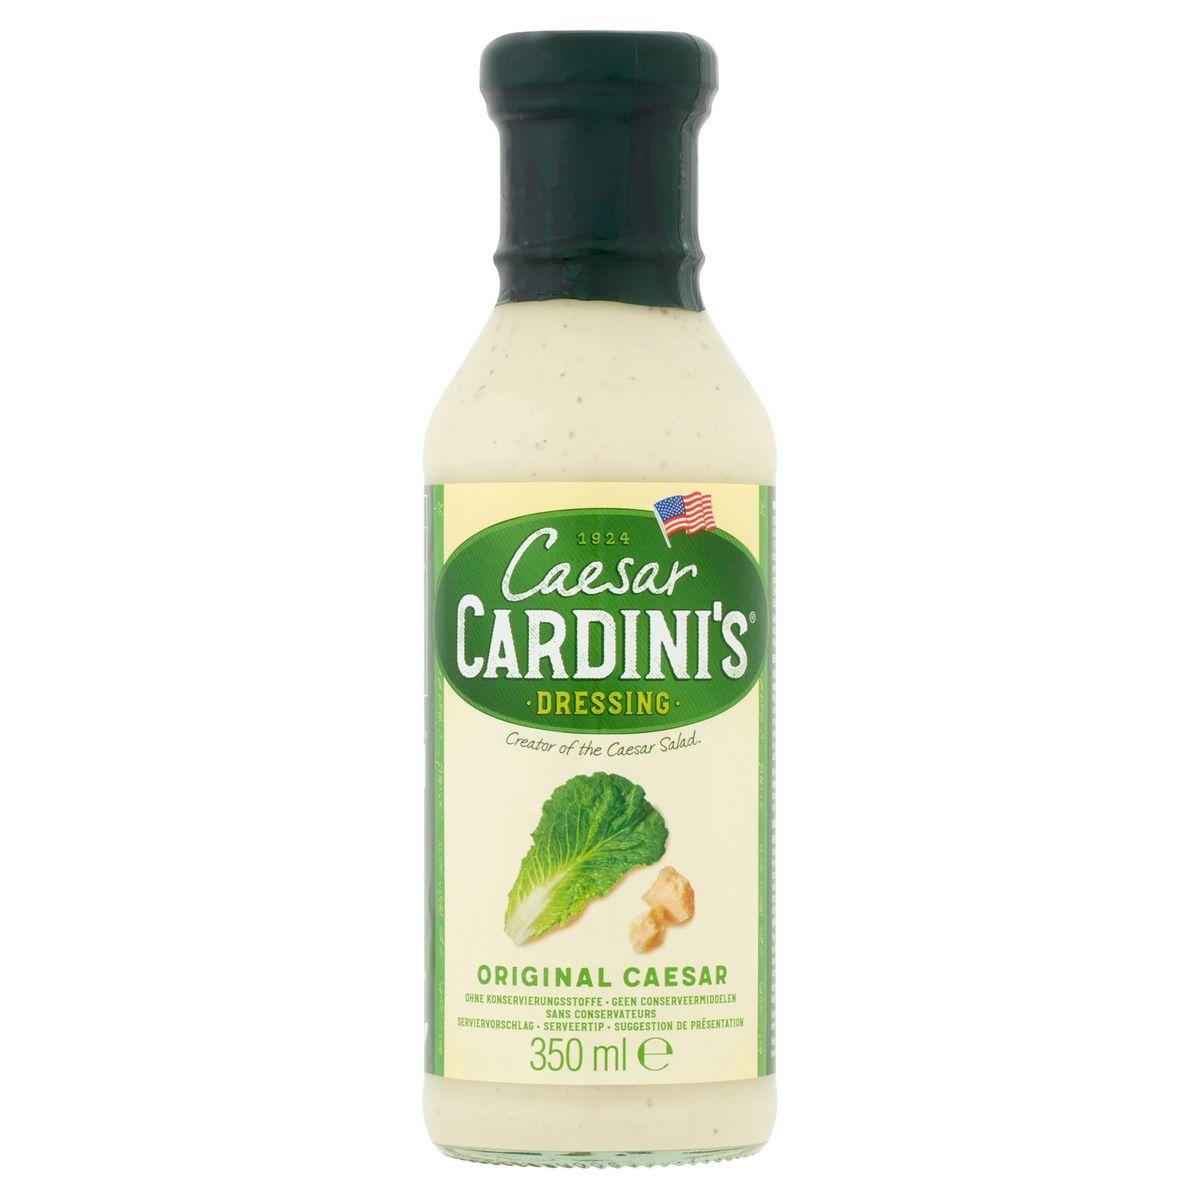 Cardini's Caesar Dressing Original 350 ml